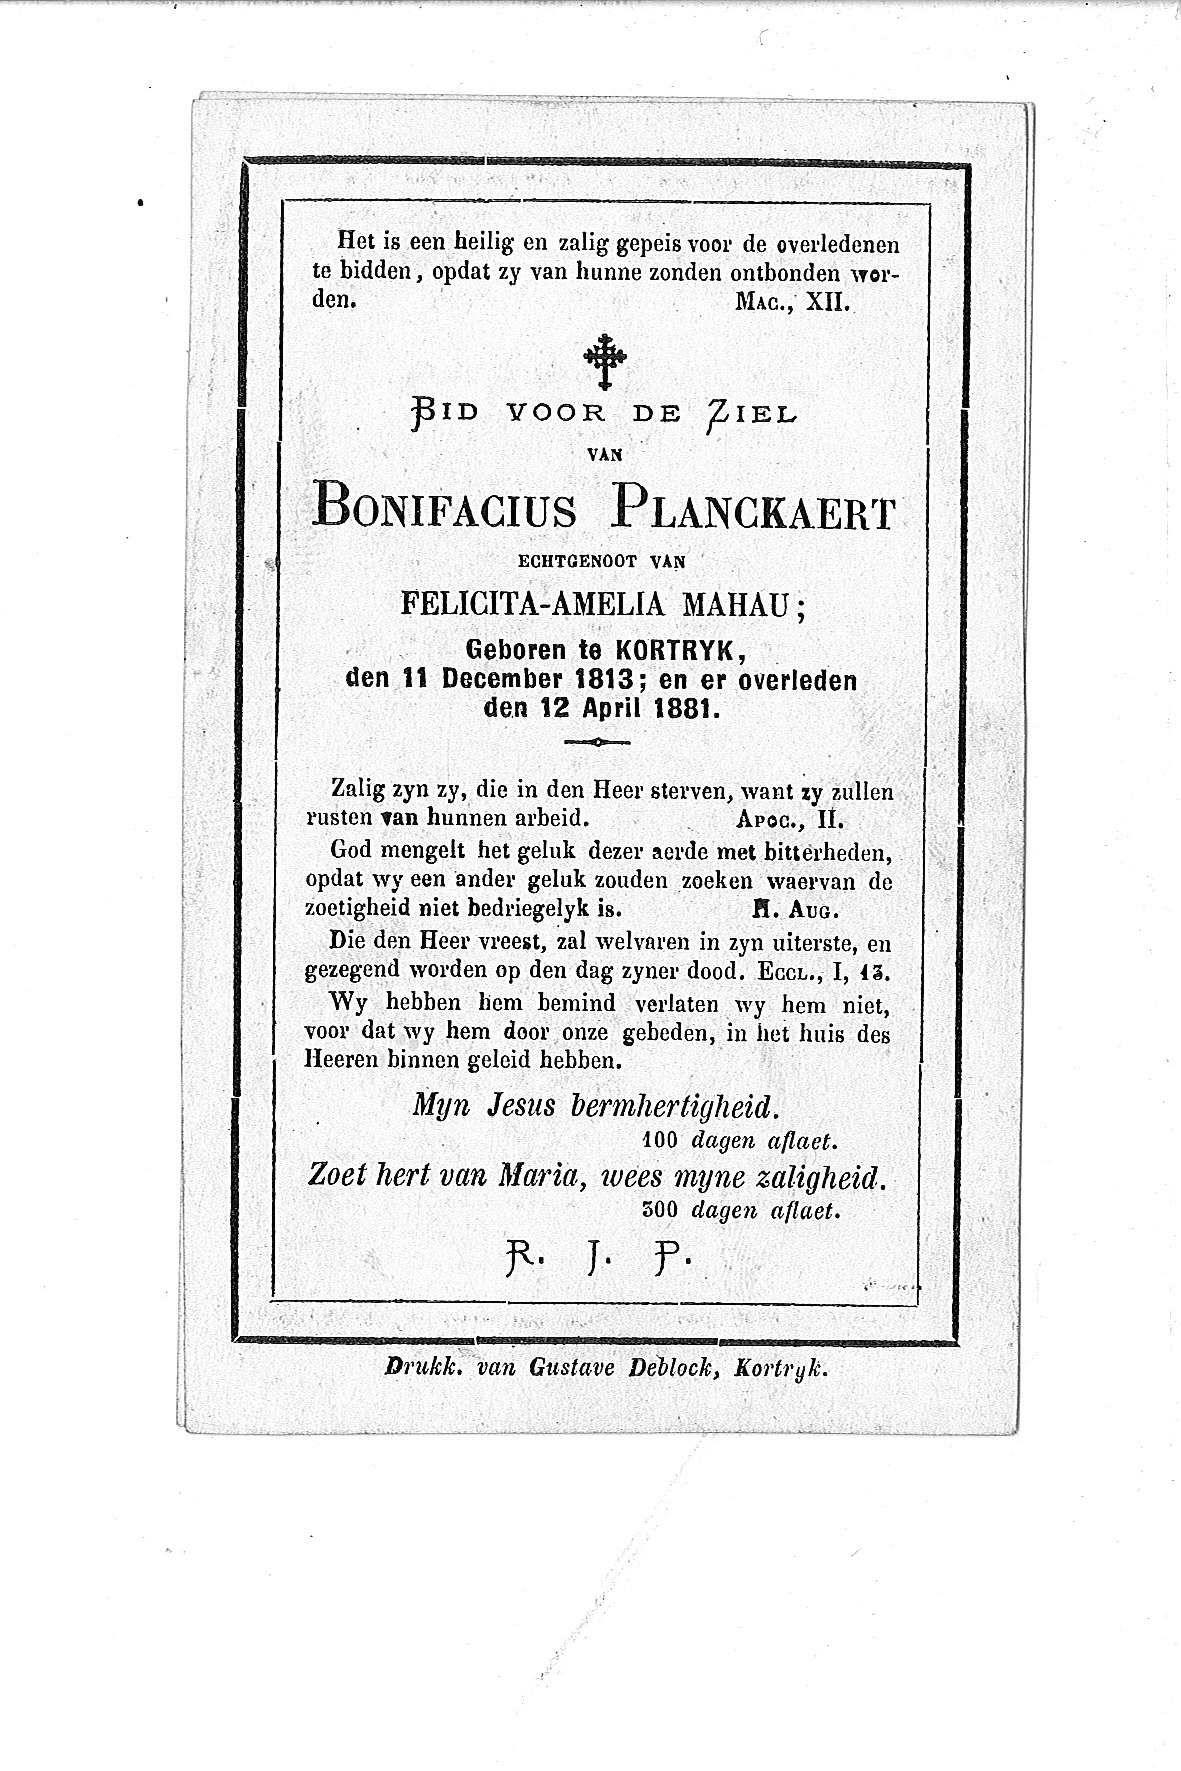 Bonifacius(1881)20100415104824_00035.jpg